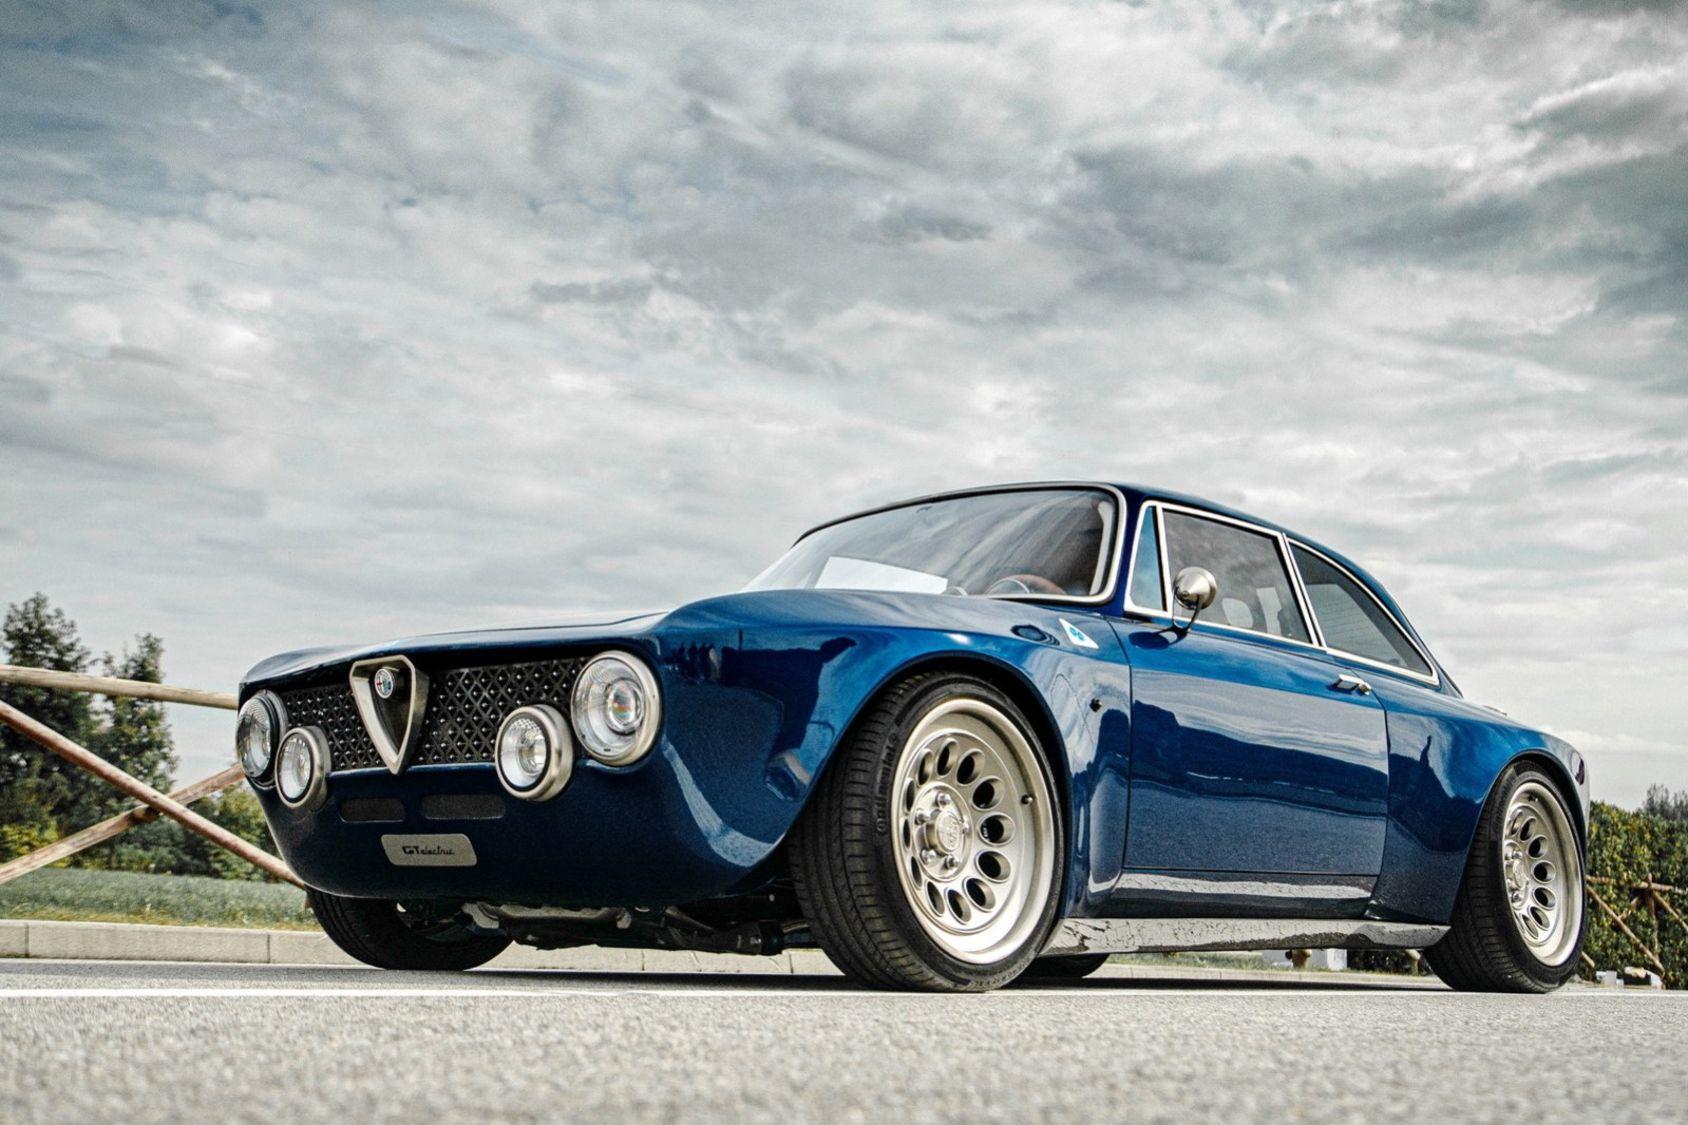 Här är Totem Automobilis eldrivna Alfa Romeo Giulia